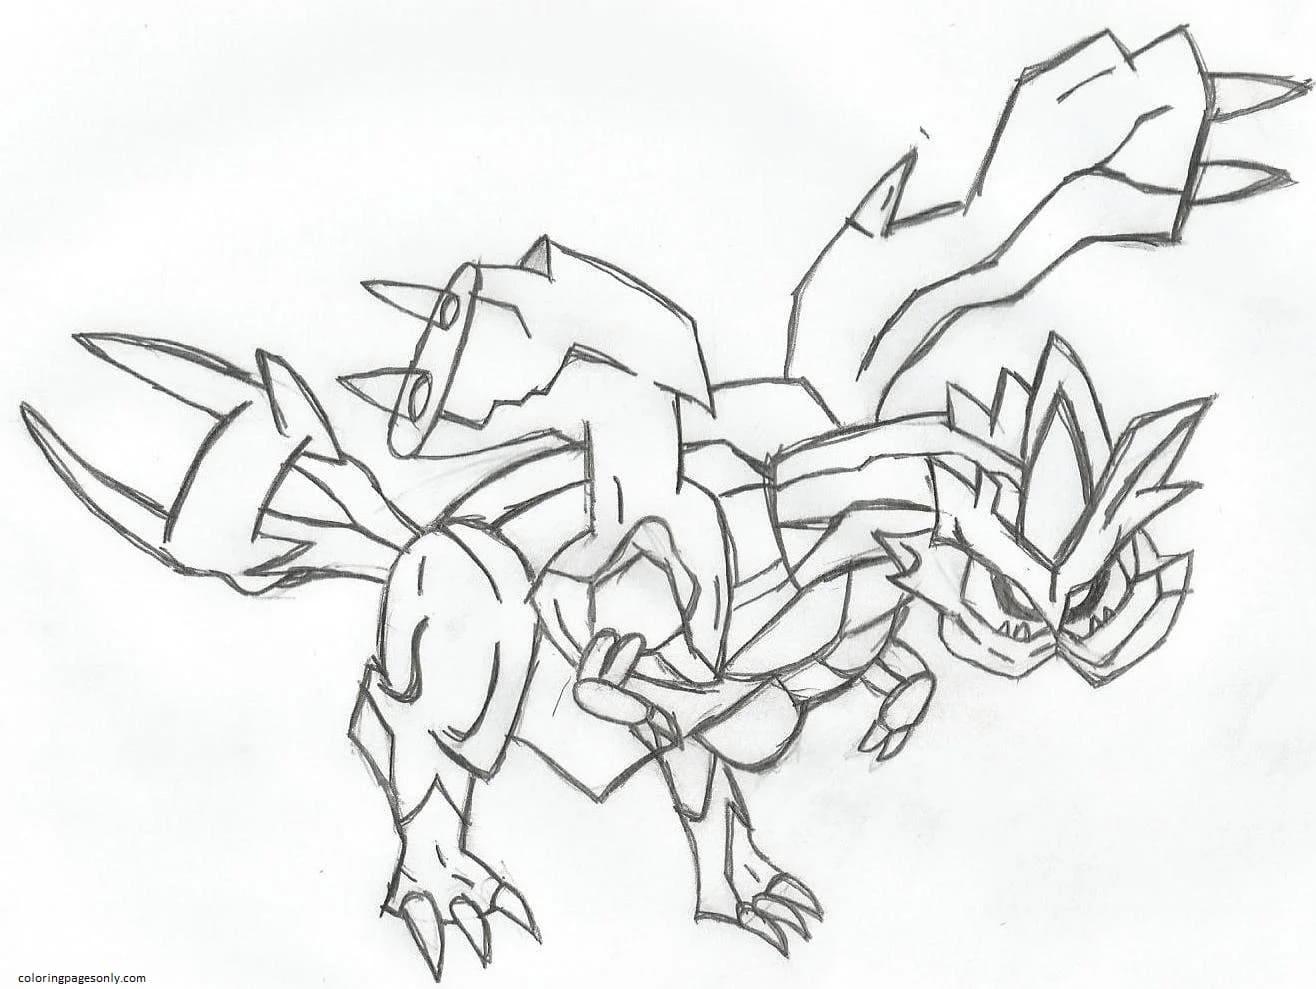 Kyurem Pokemon 1 Coloring Page